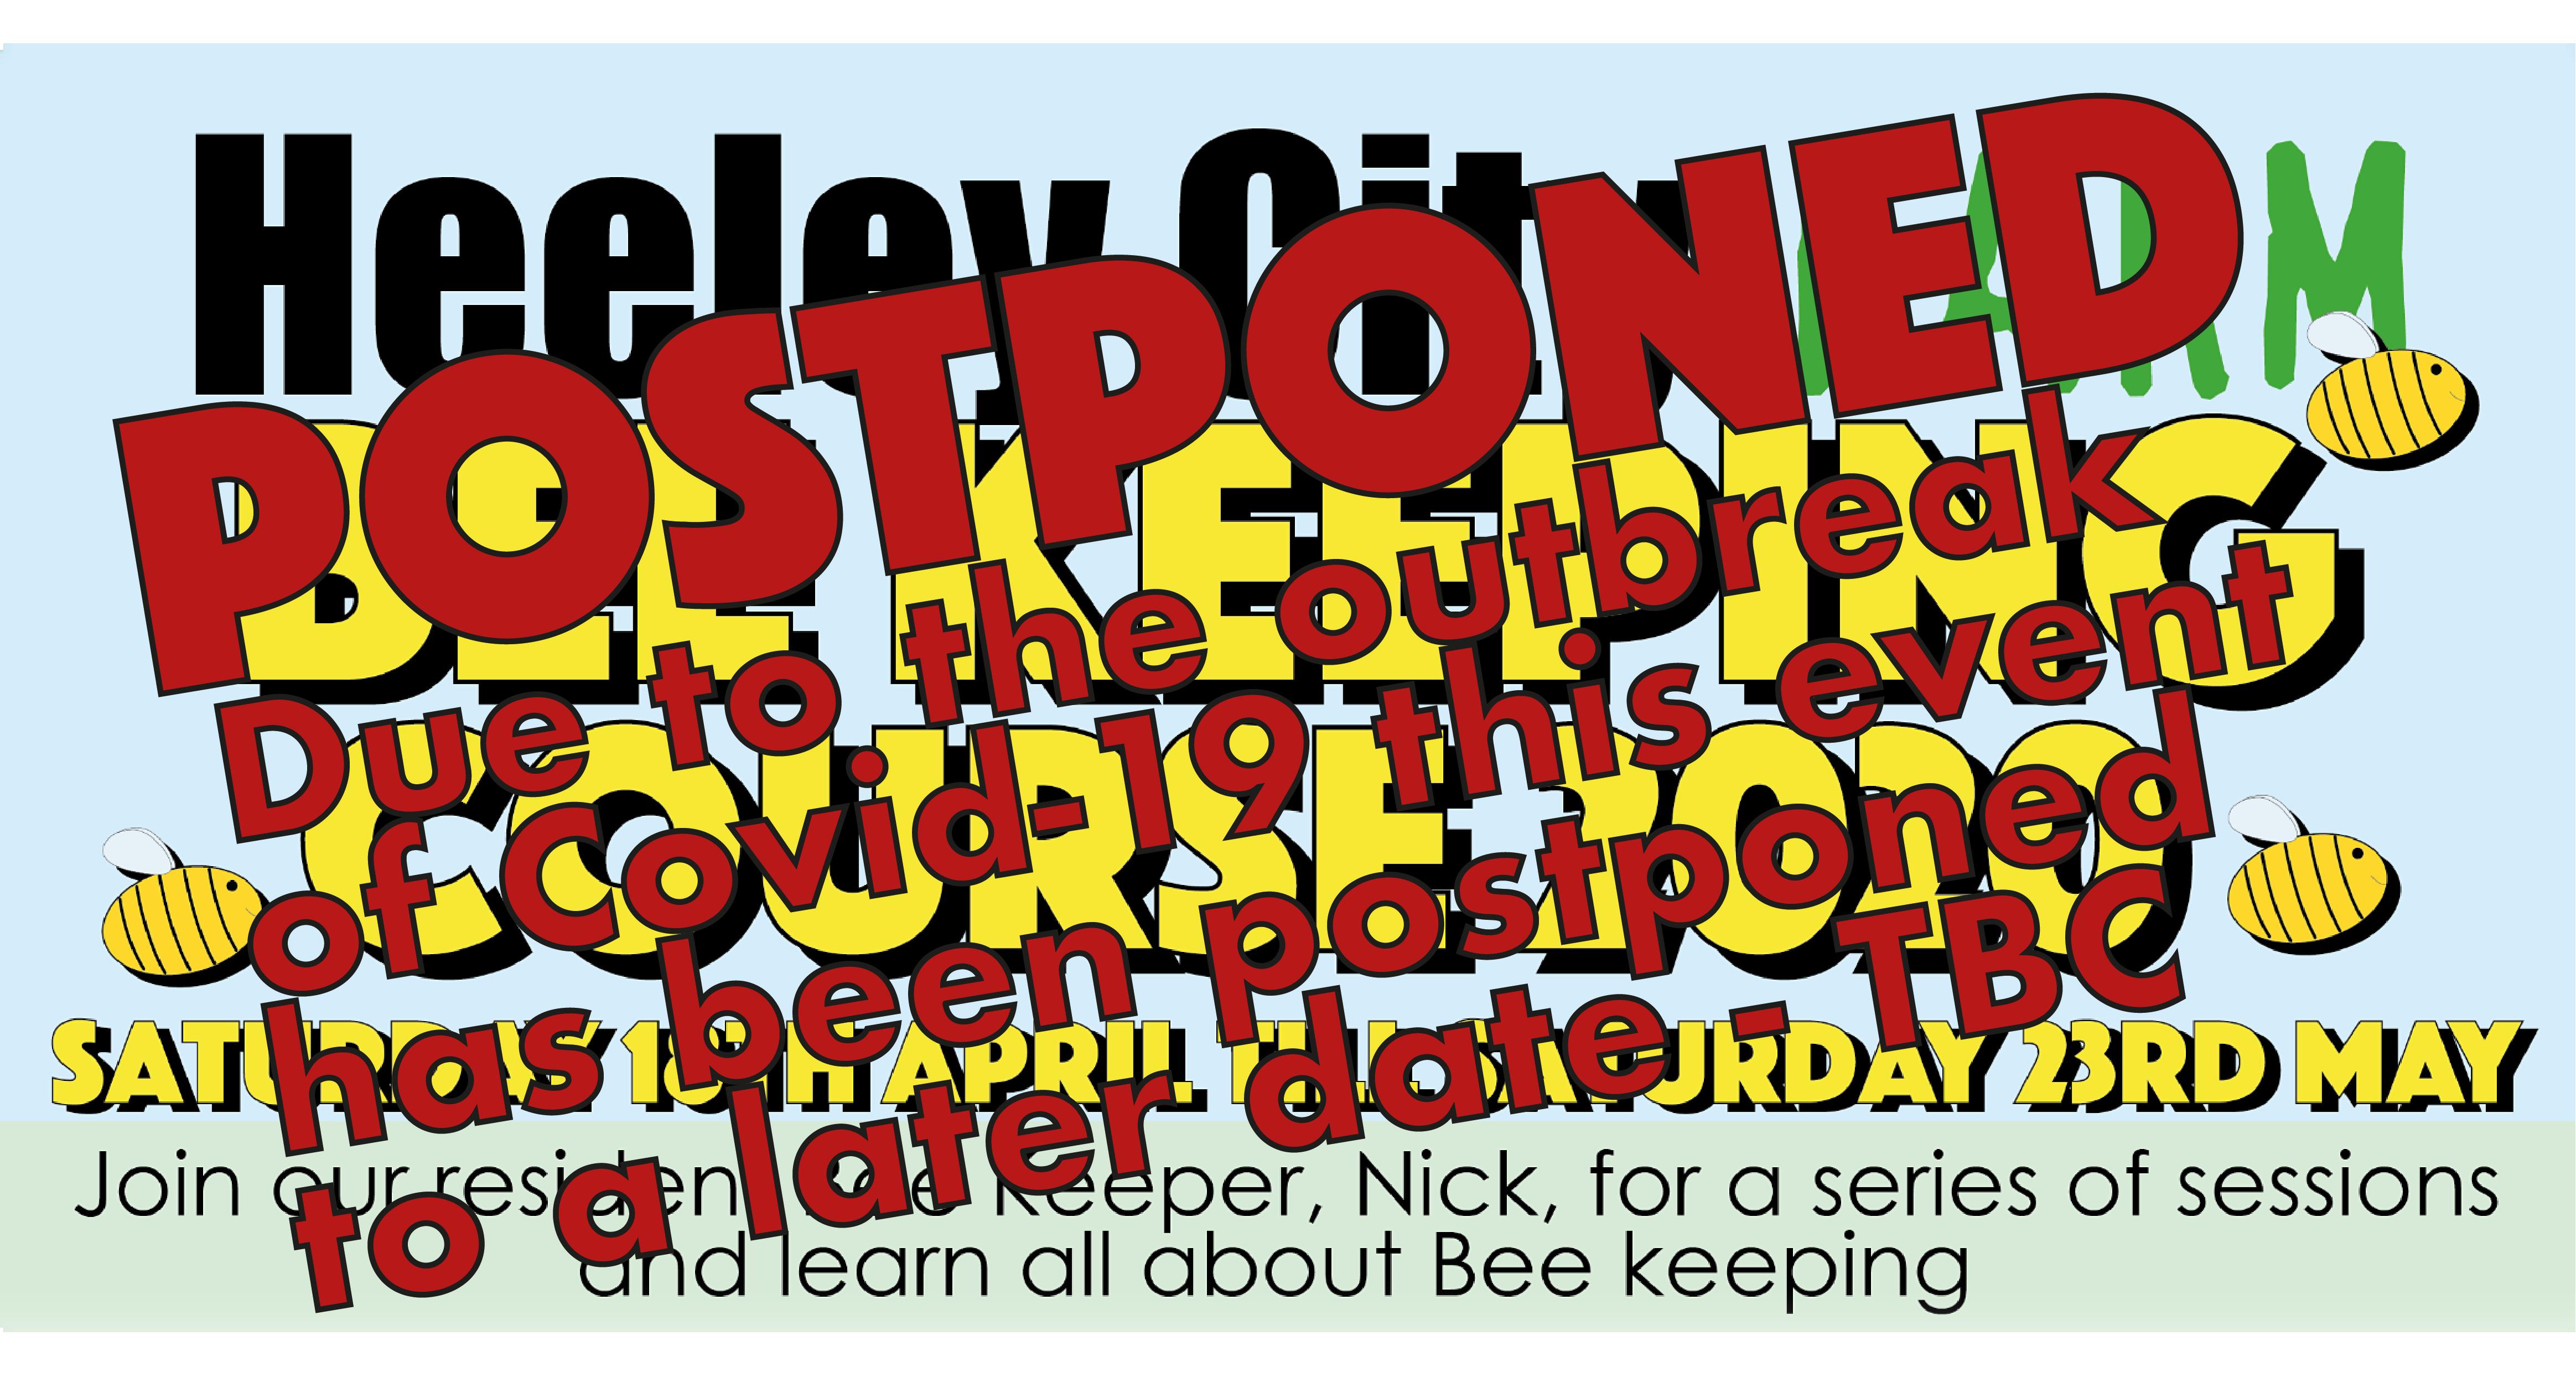 Heeley City Farm Bee Keeping Course 2020